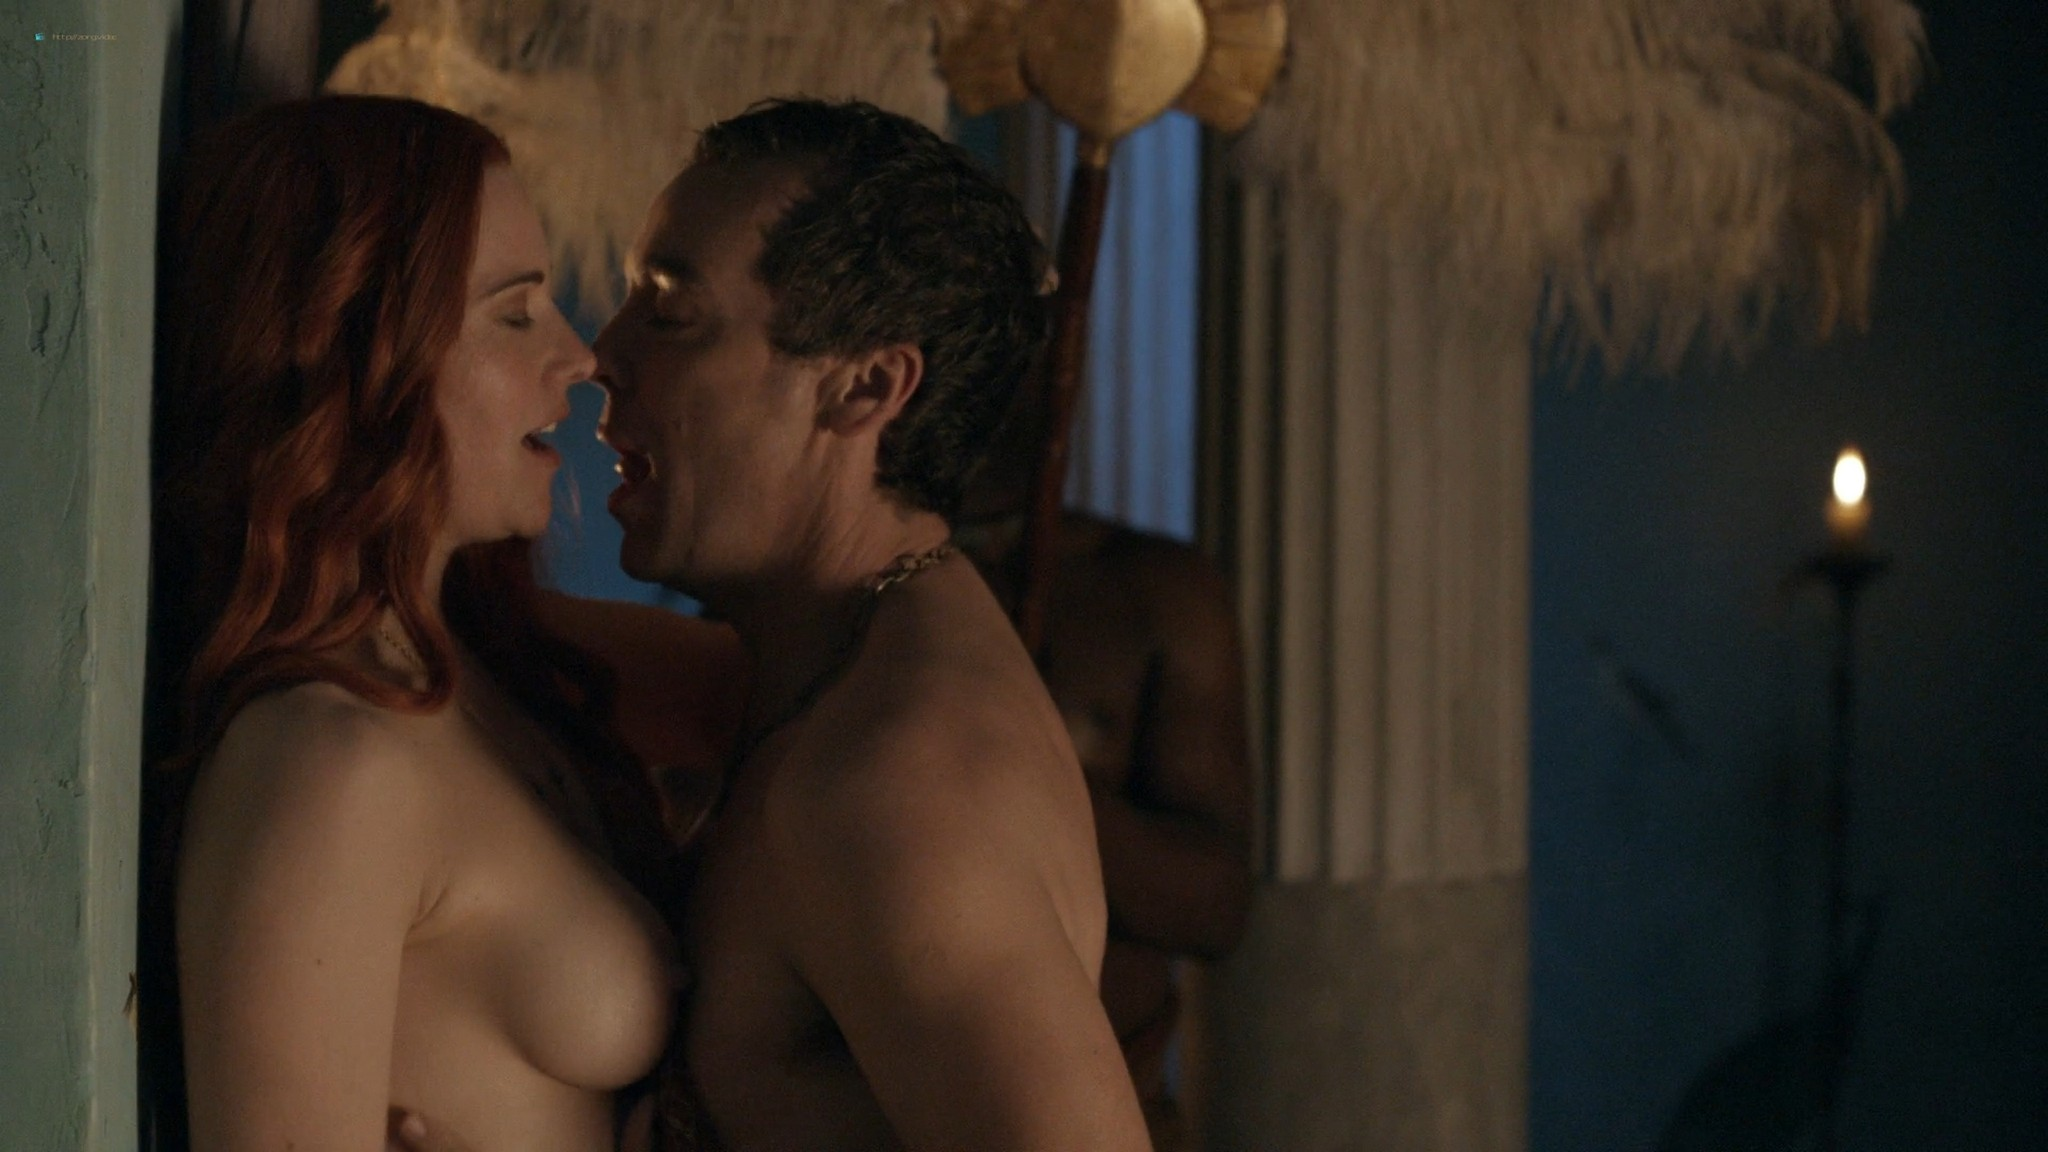 Lucy Lawless nude sex Erin Cummings, Aria Dickson nude too - Spartacus - Sacramentum Gladiatorum (2010) s1e2 HD 1080p (5)